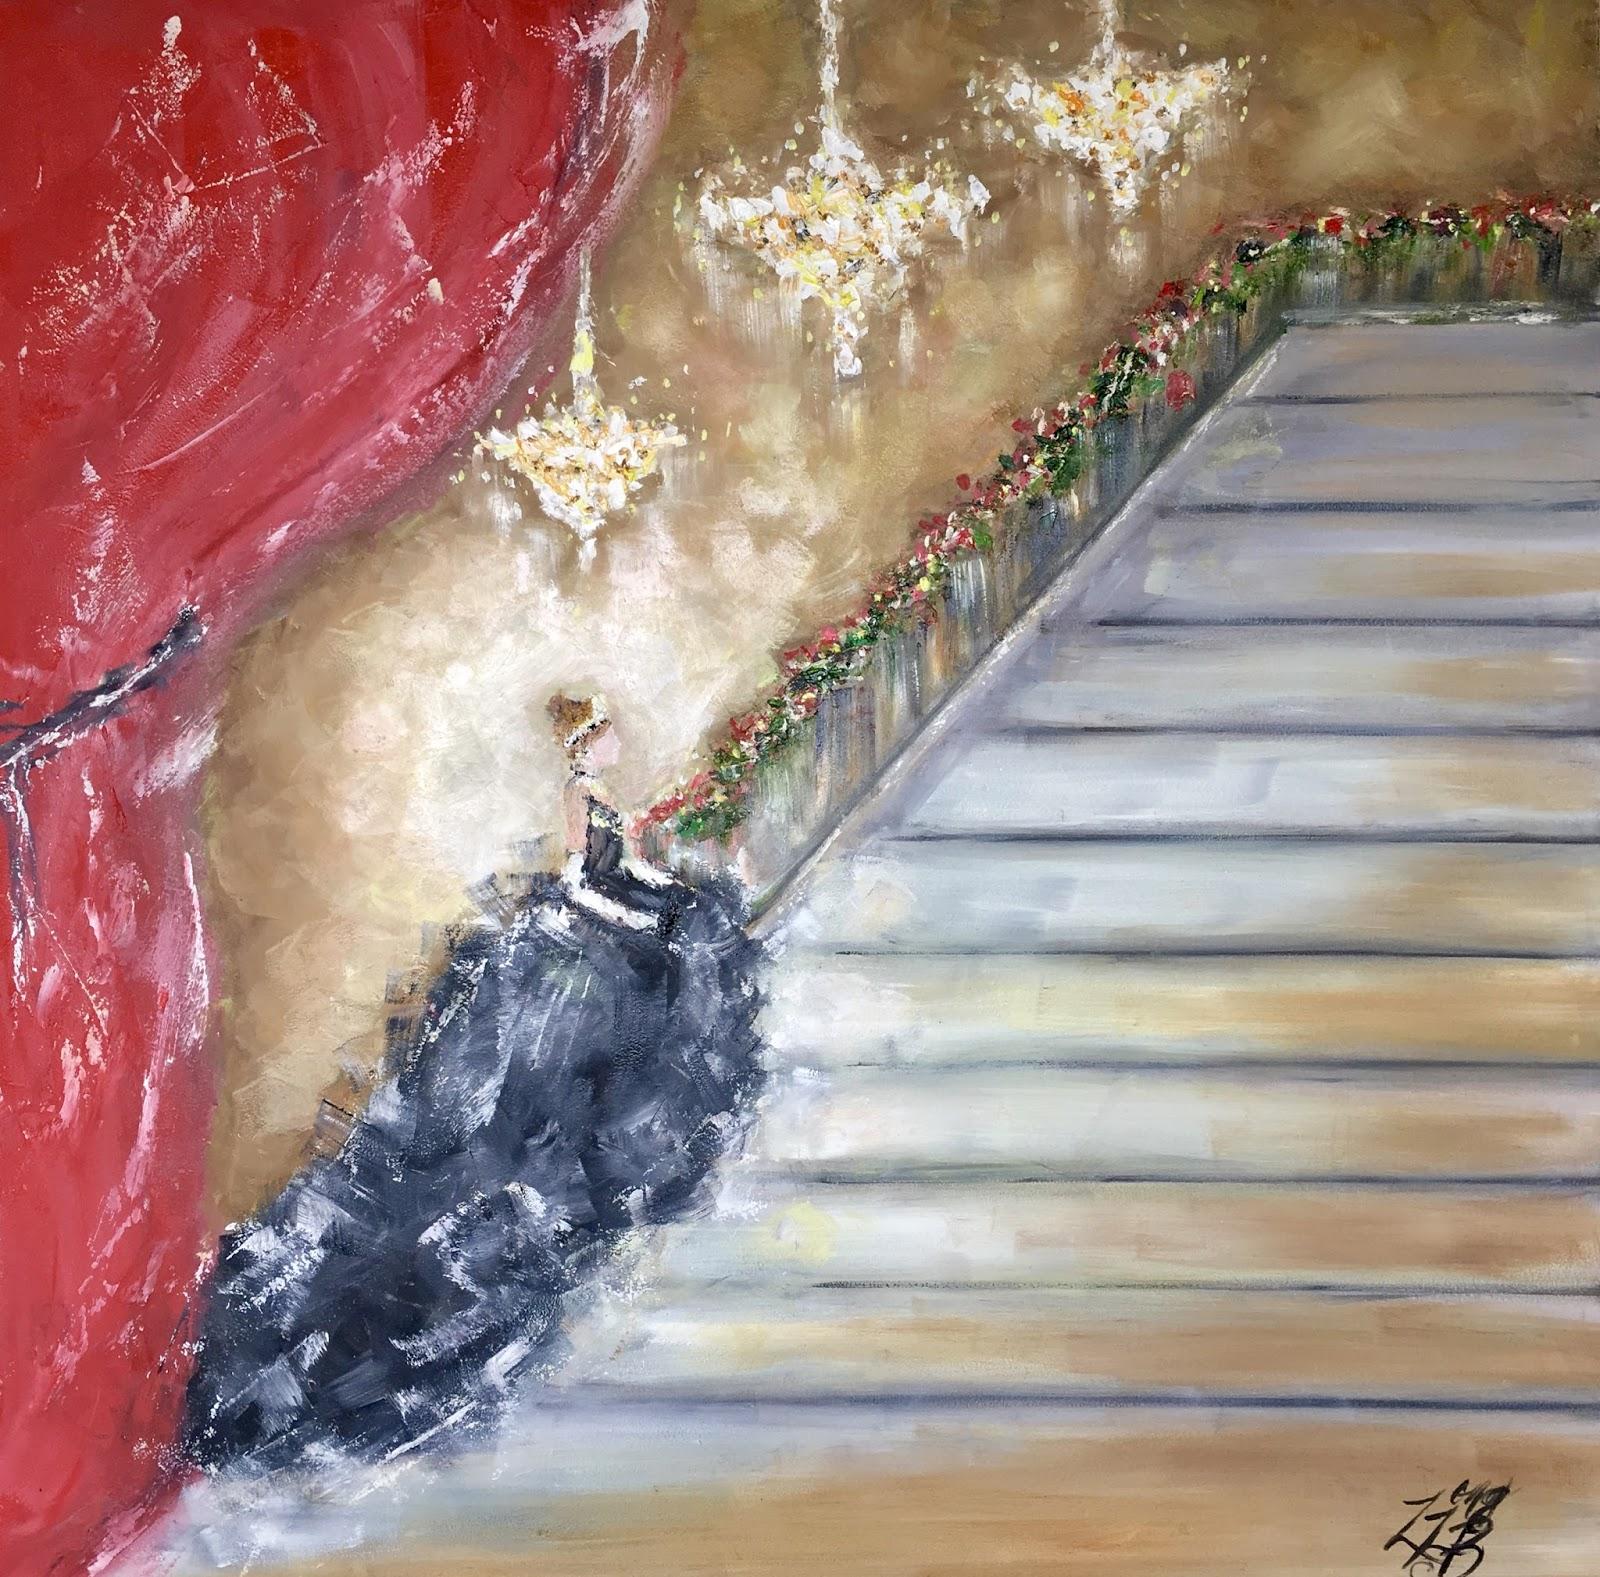 Art by ZsaZsa Bellagio December 20, 20   ZsaZsa Bellagio   Like ...